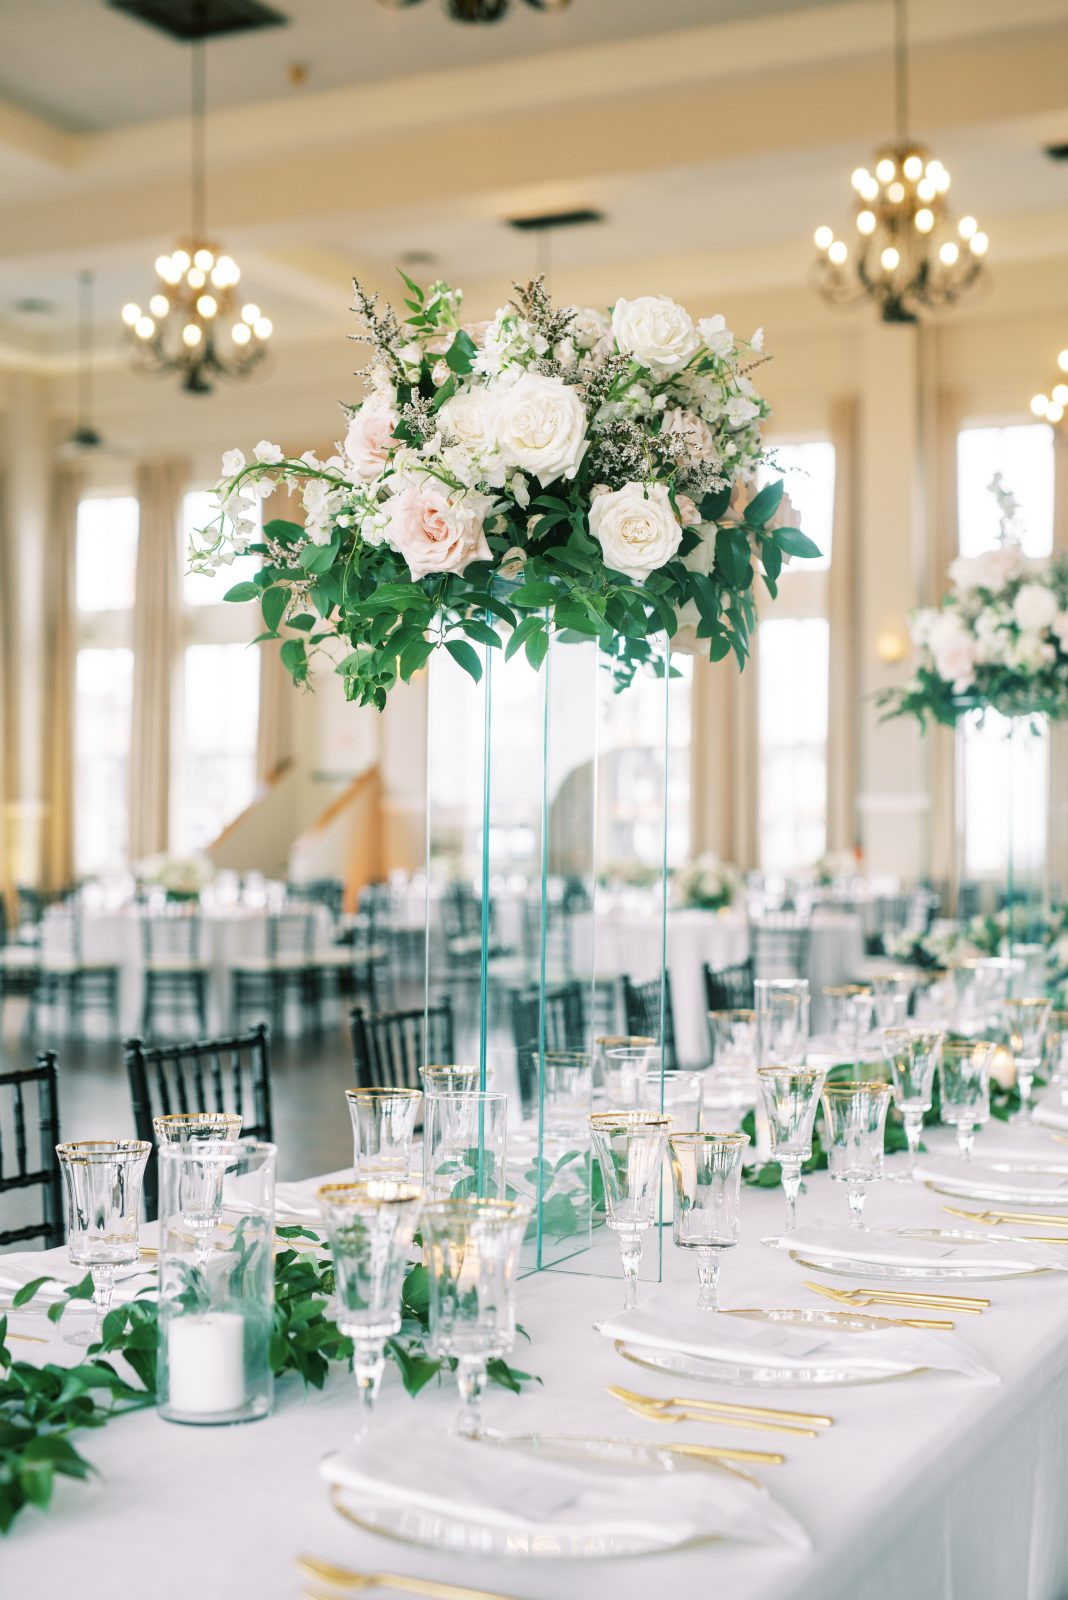 Elegant wedding decor at Room on Main